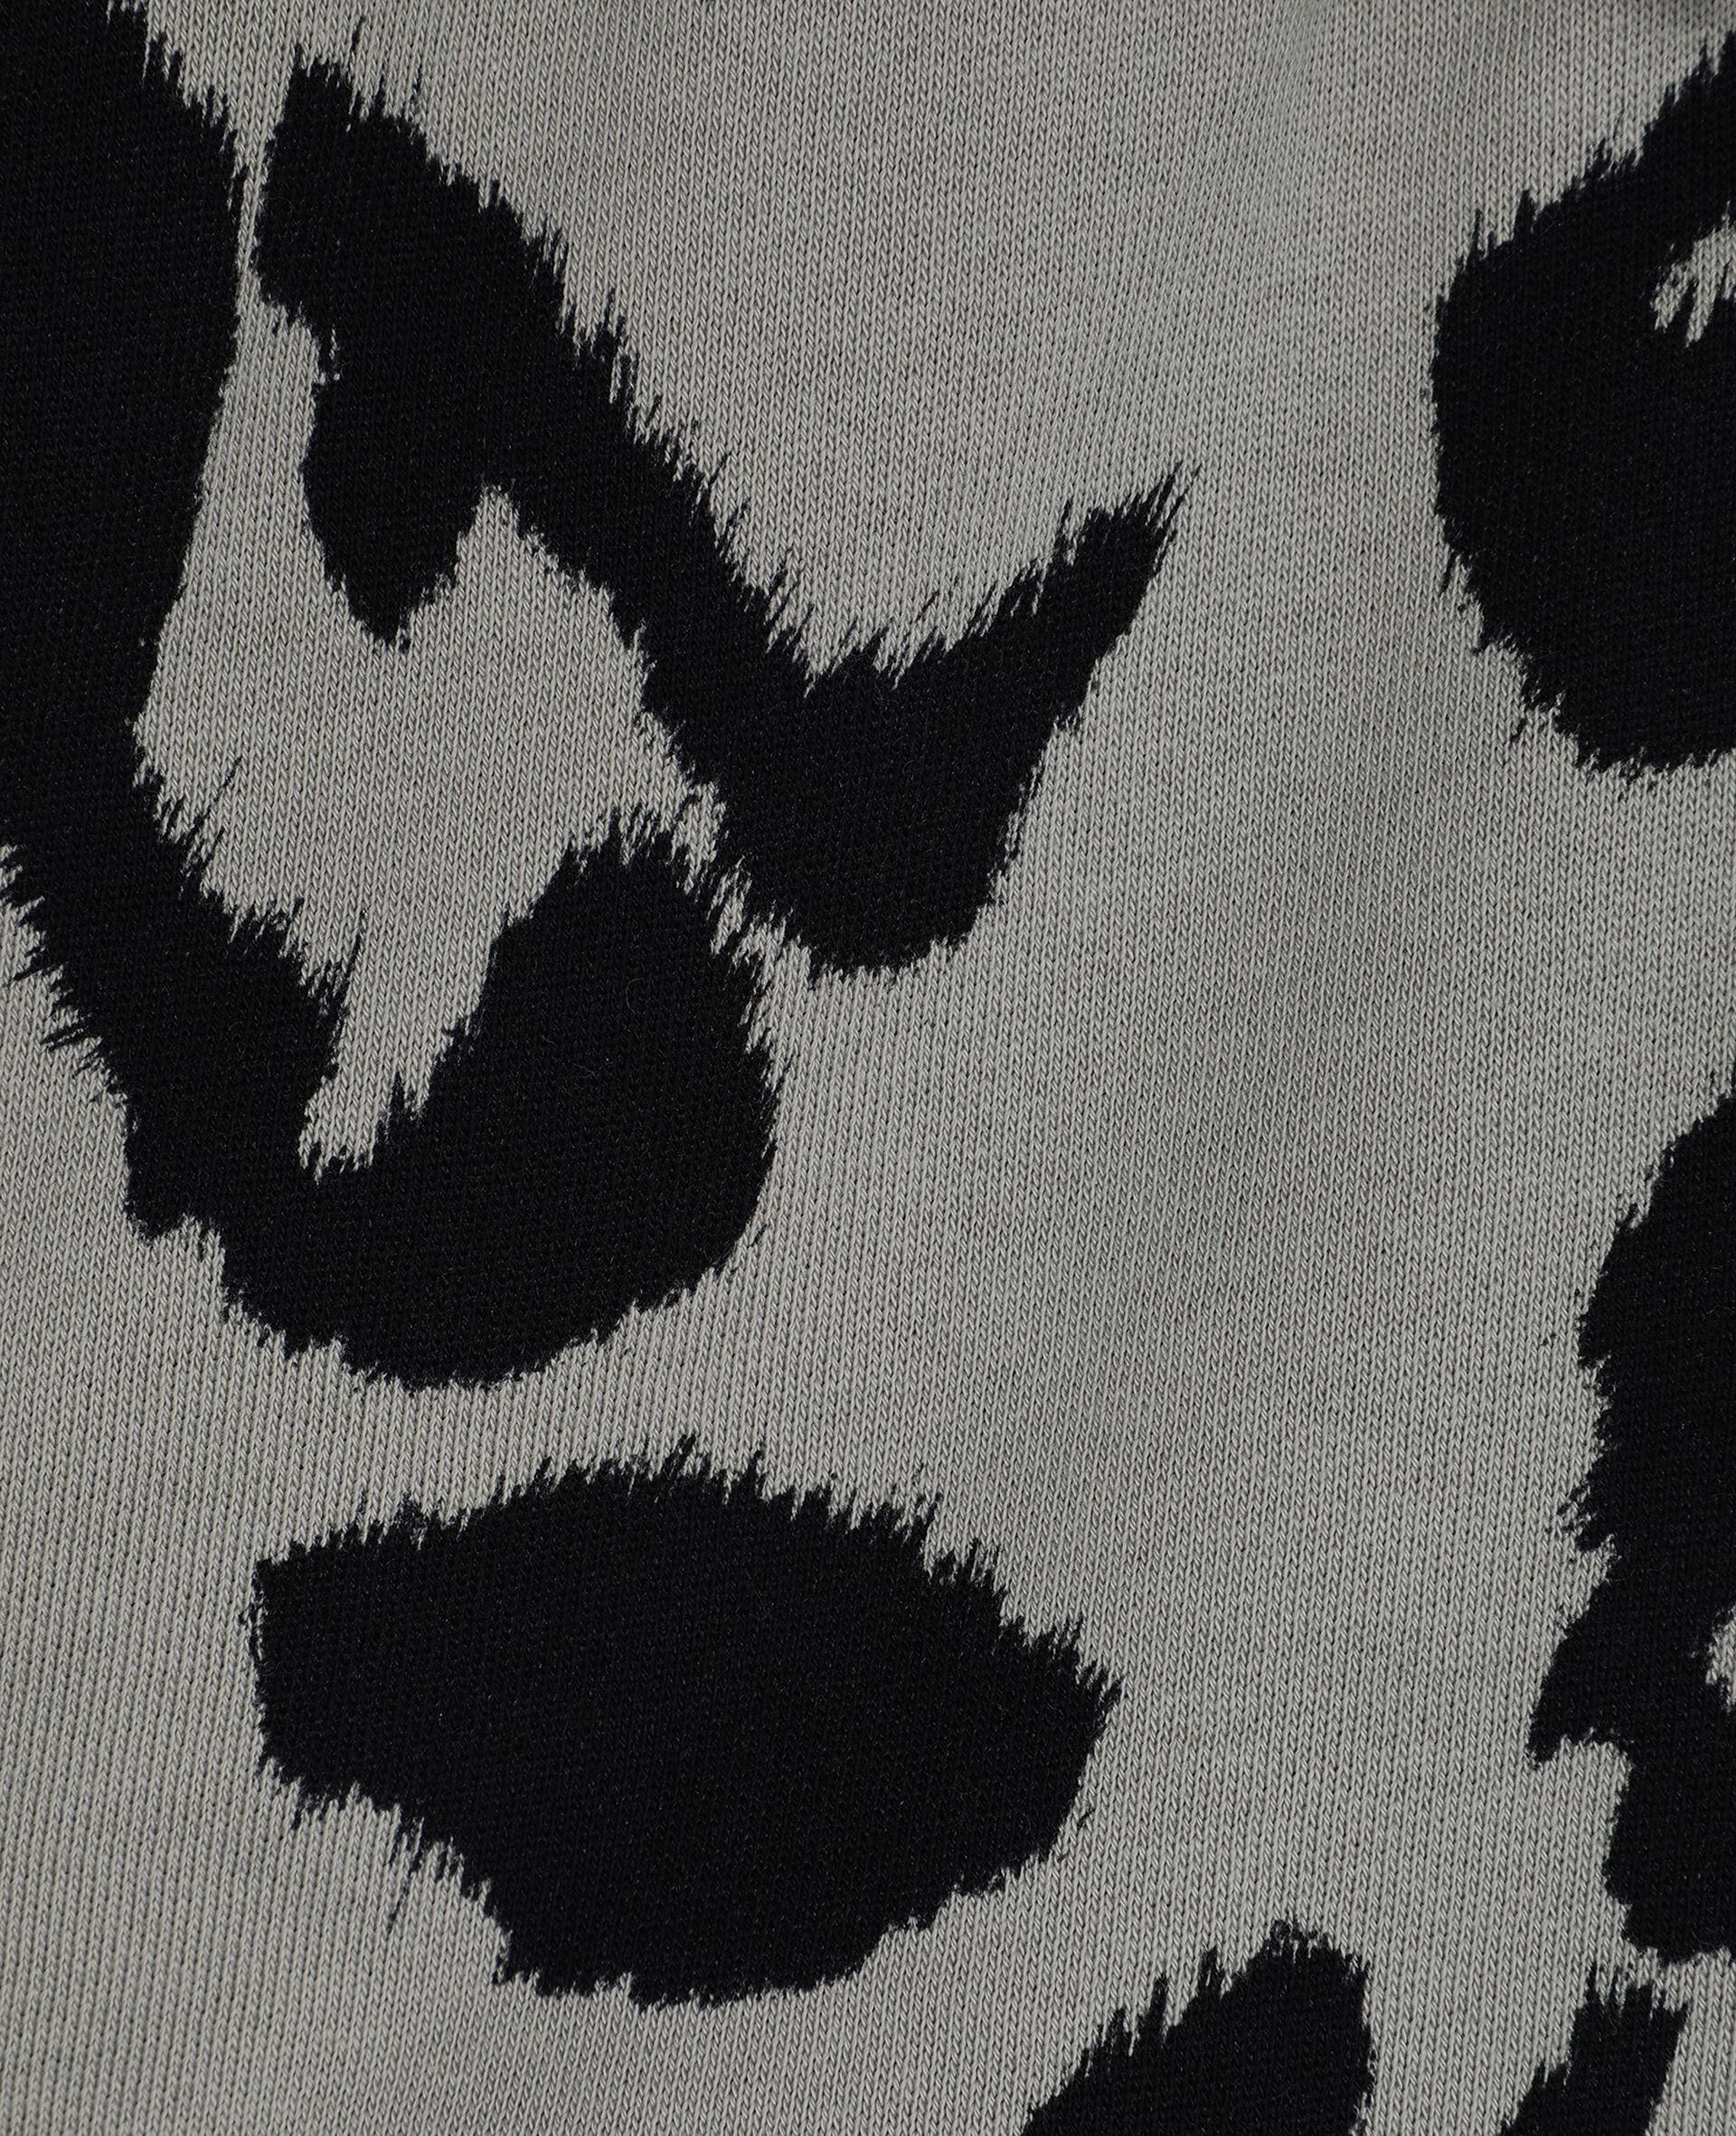 Baumwollfleece-Shorts mit Leoparden-Print-Bunt-large image number 1